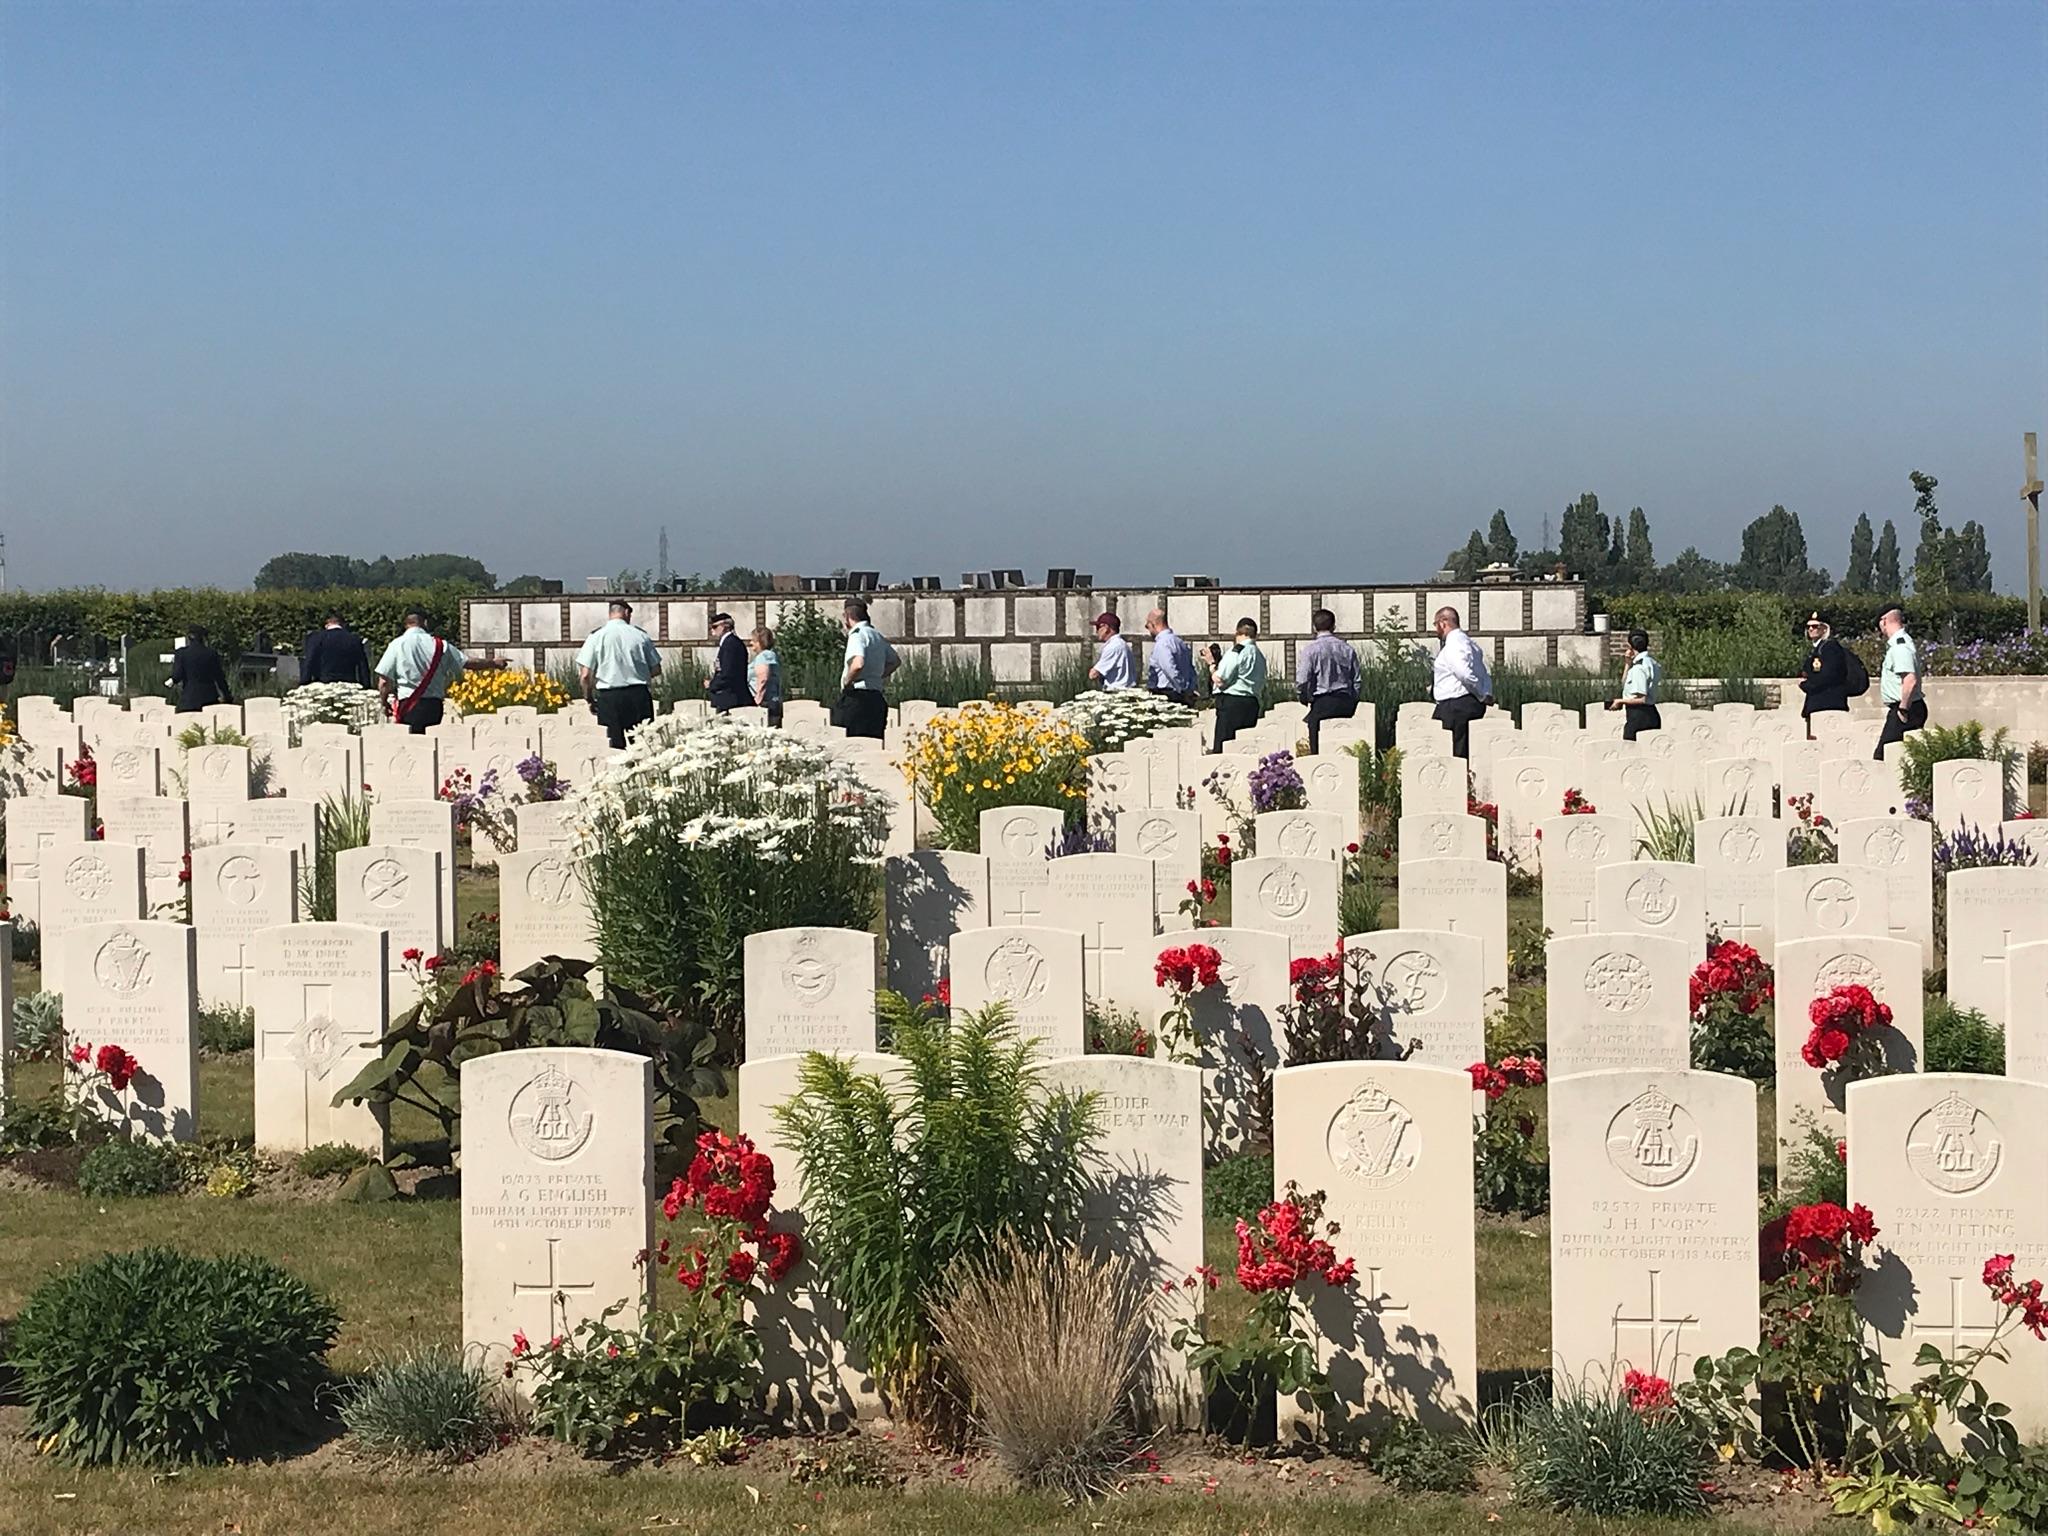 Gravesites at a British cemetery.